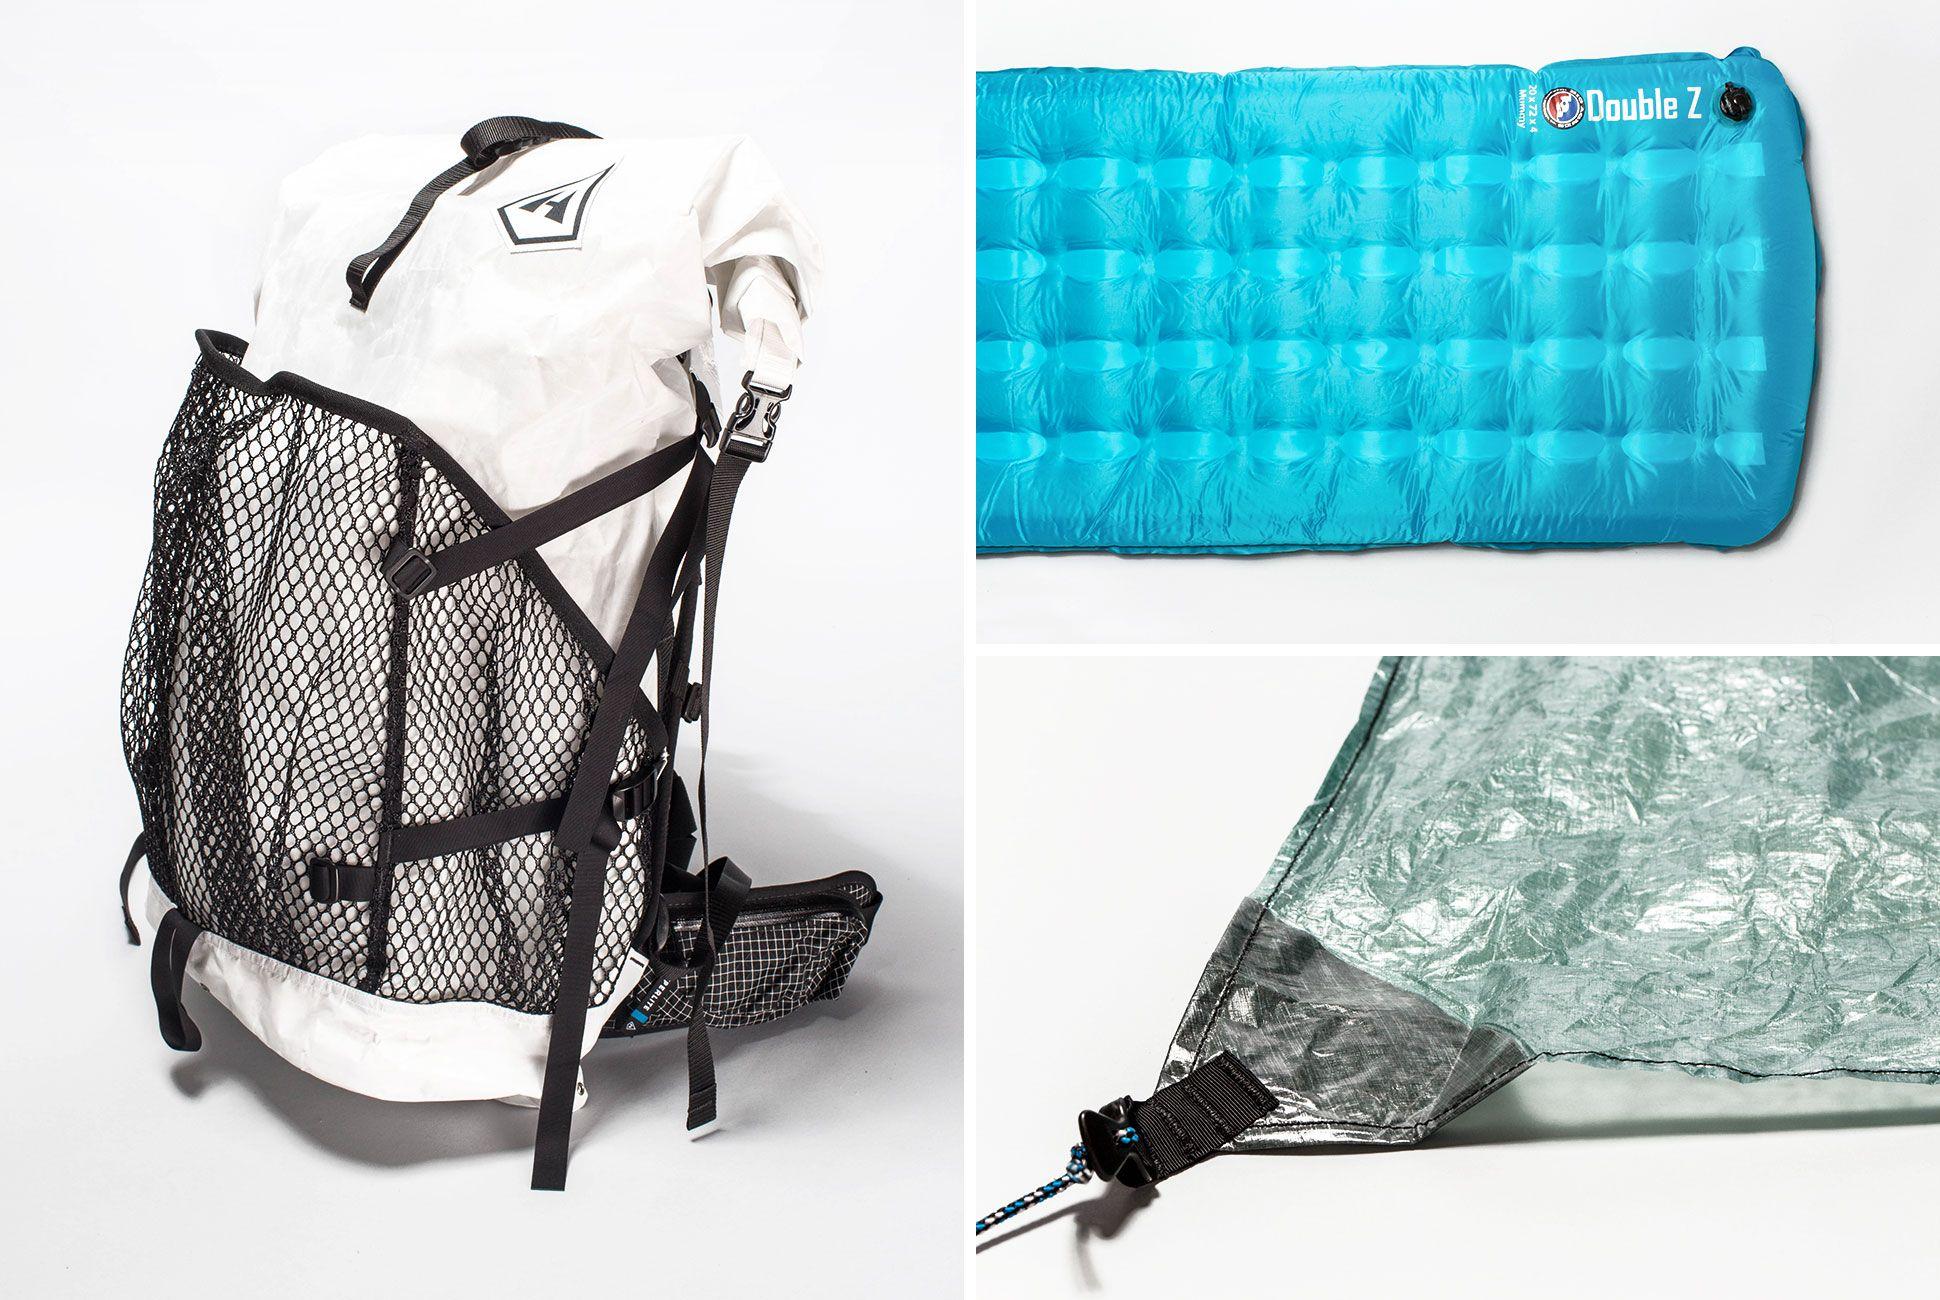 backcountry-camping-kit-hardgoods-2